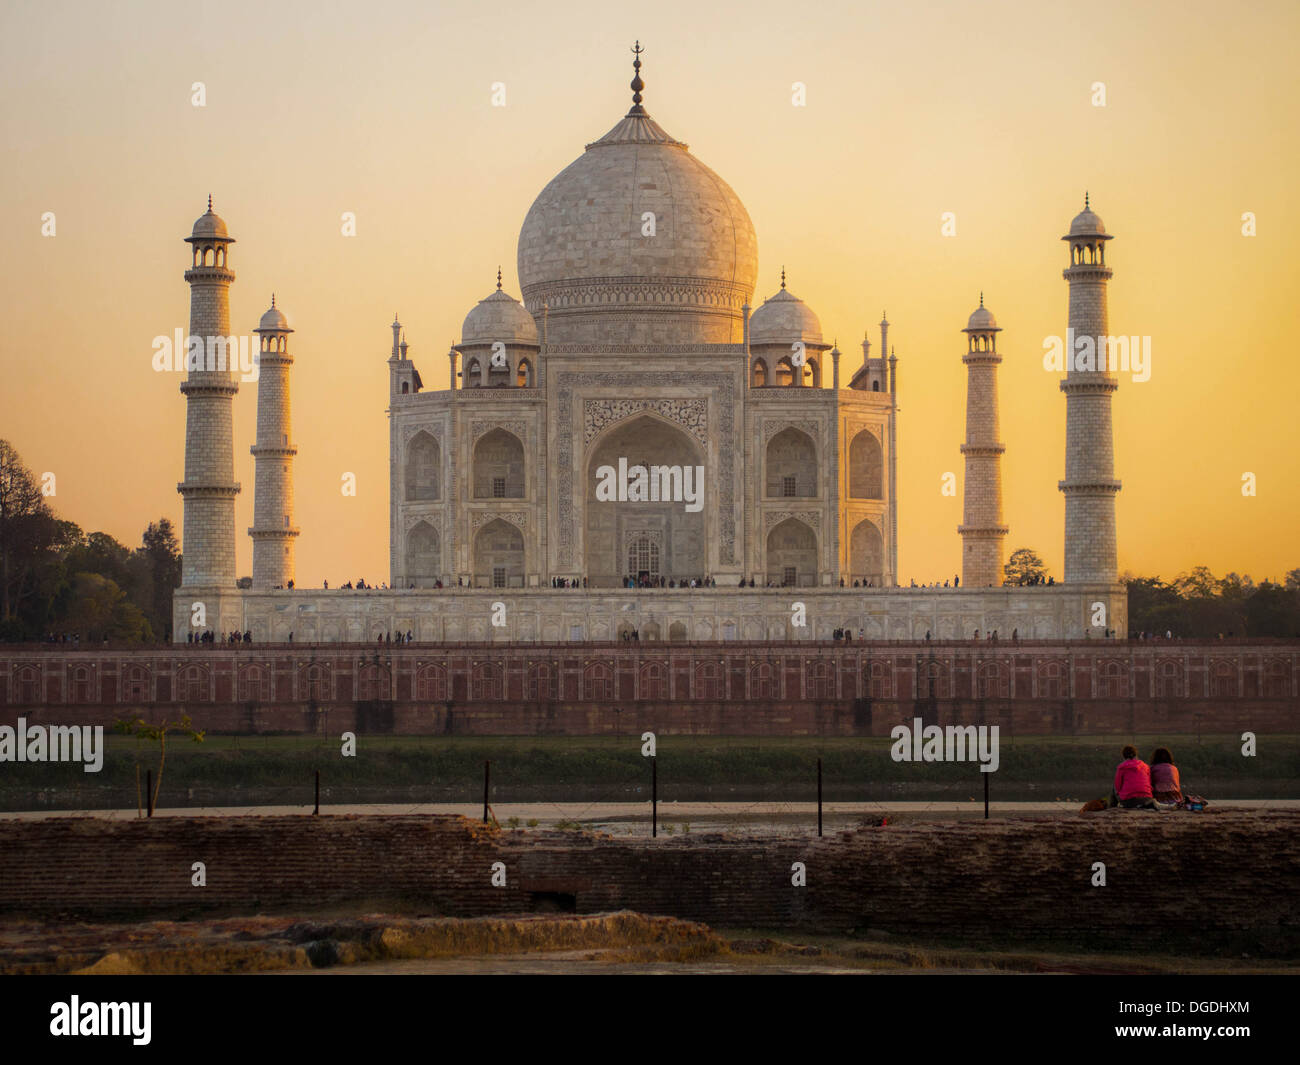 El Taj Mahal al atardecer, Agra, India. Imagen De Stock